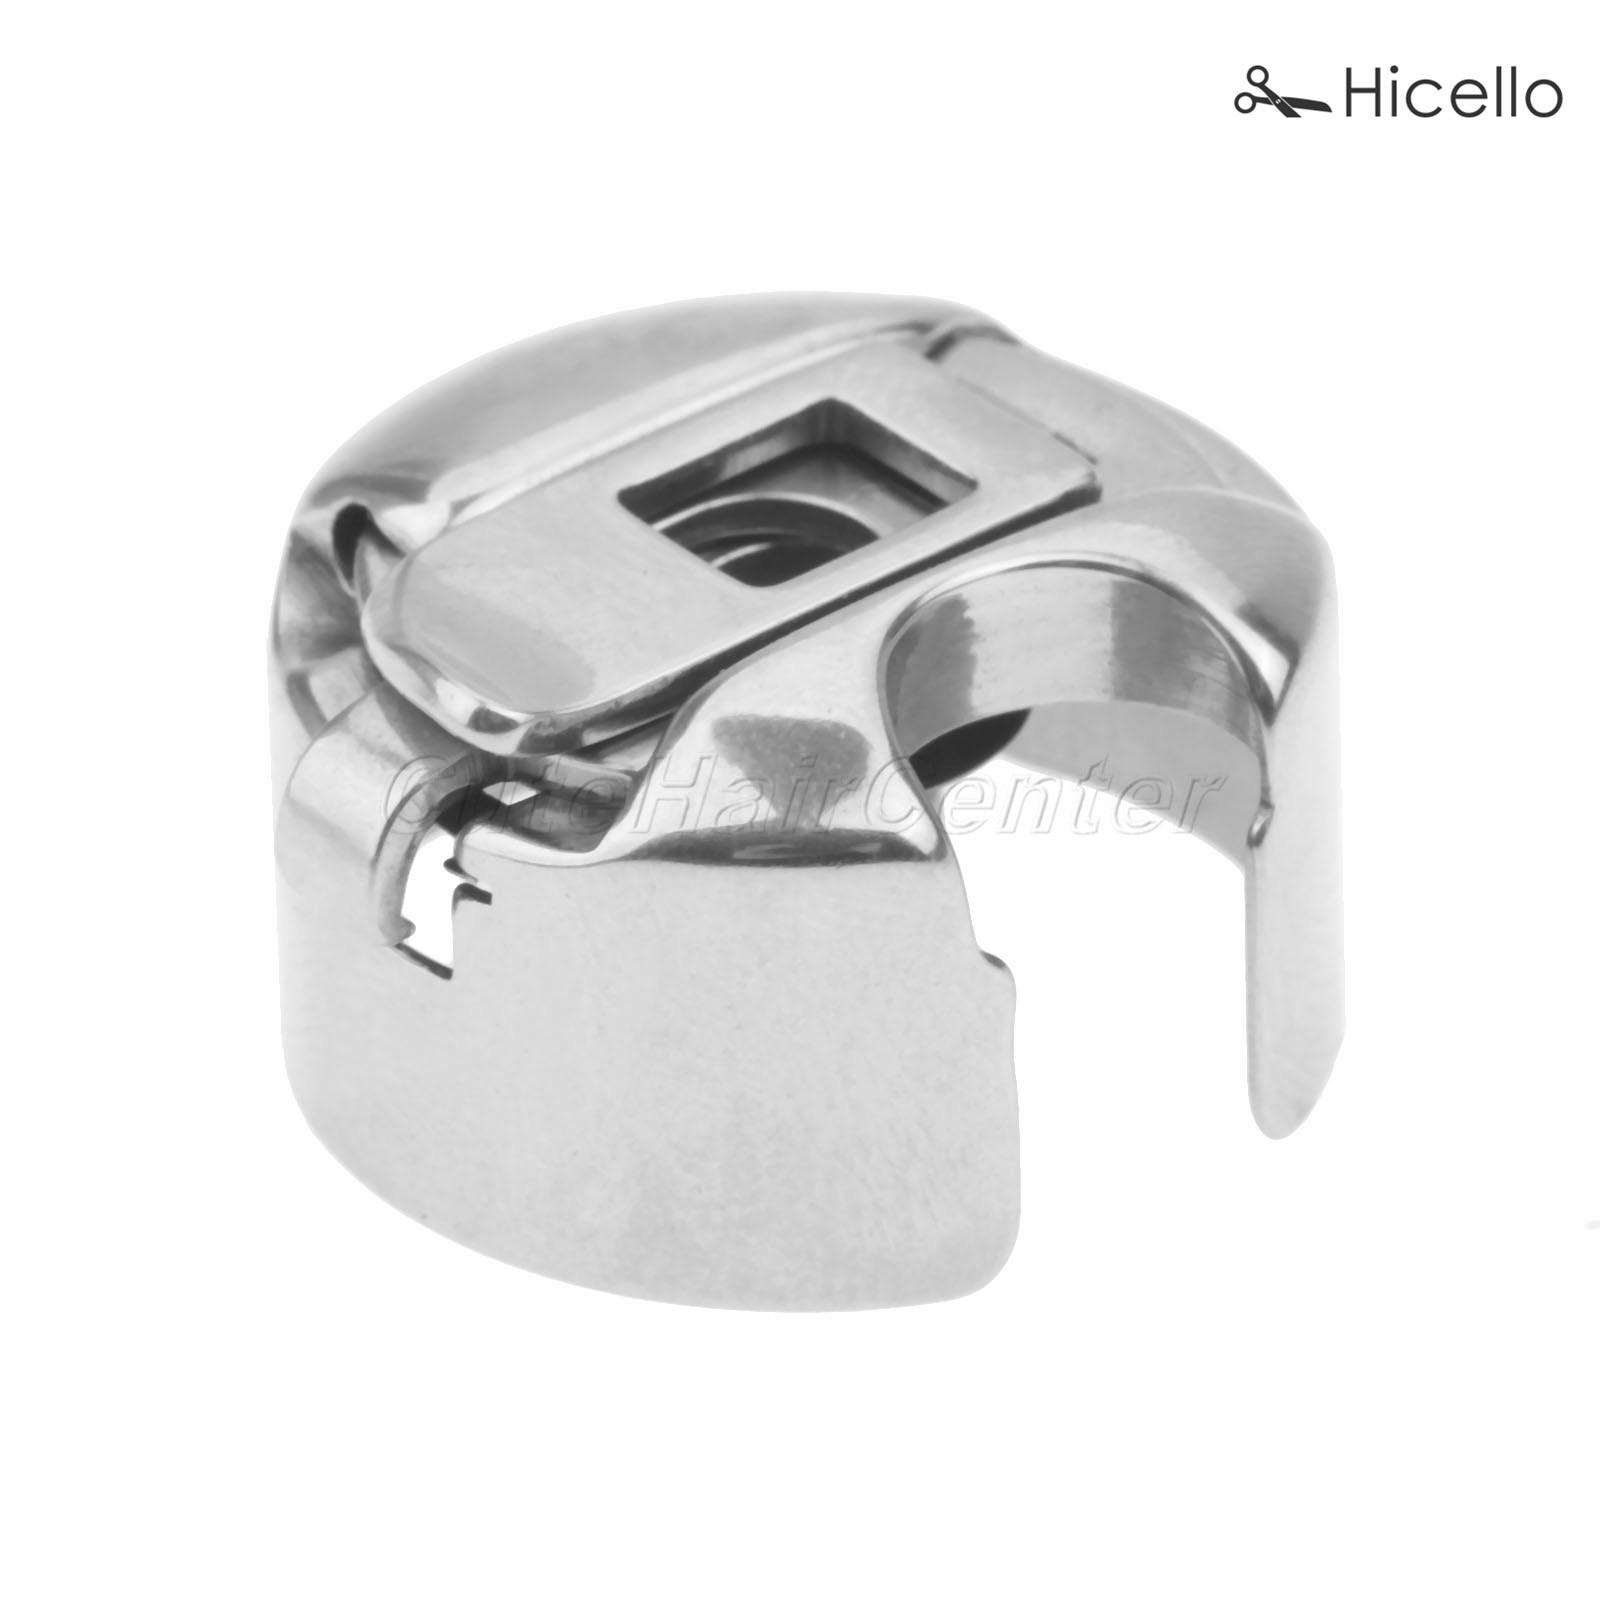 Industrial Sewing Machine Bobbin Case Steel Silver 1/8 for lockstitch Brother/SINGER/PFAFF/JUKI/WINSEW/PROSEW machine Hicello